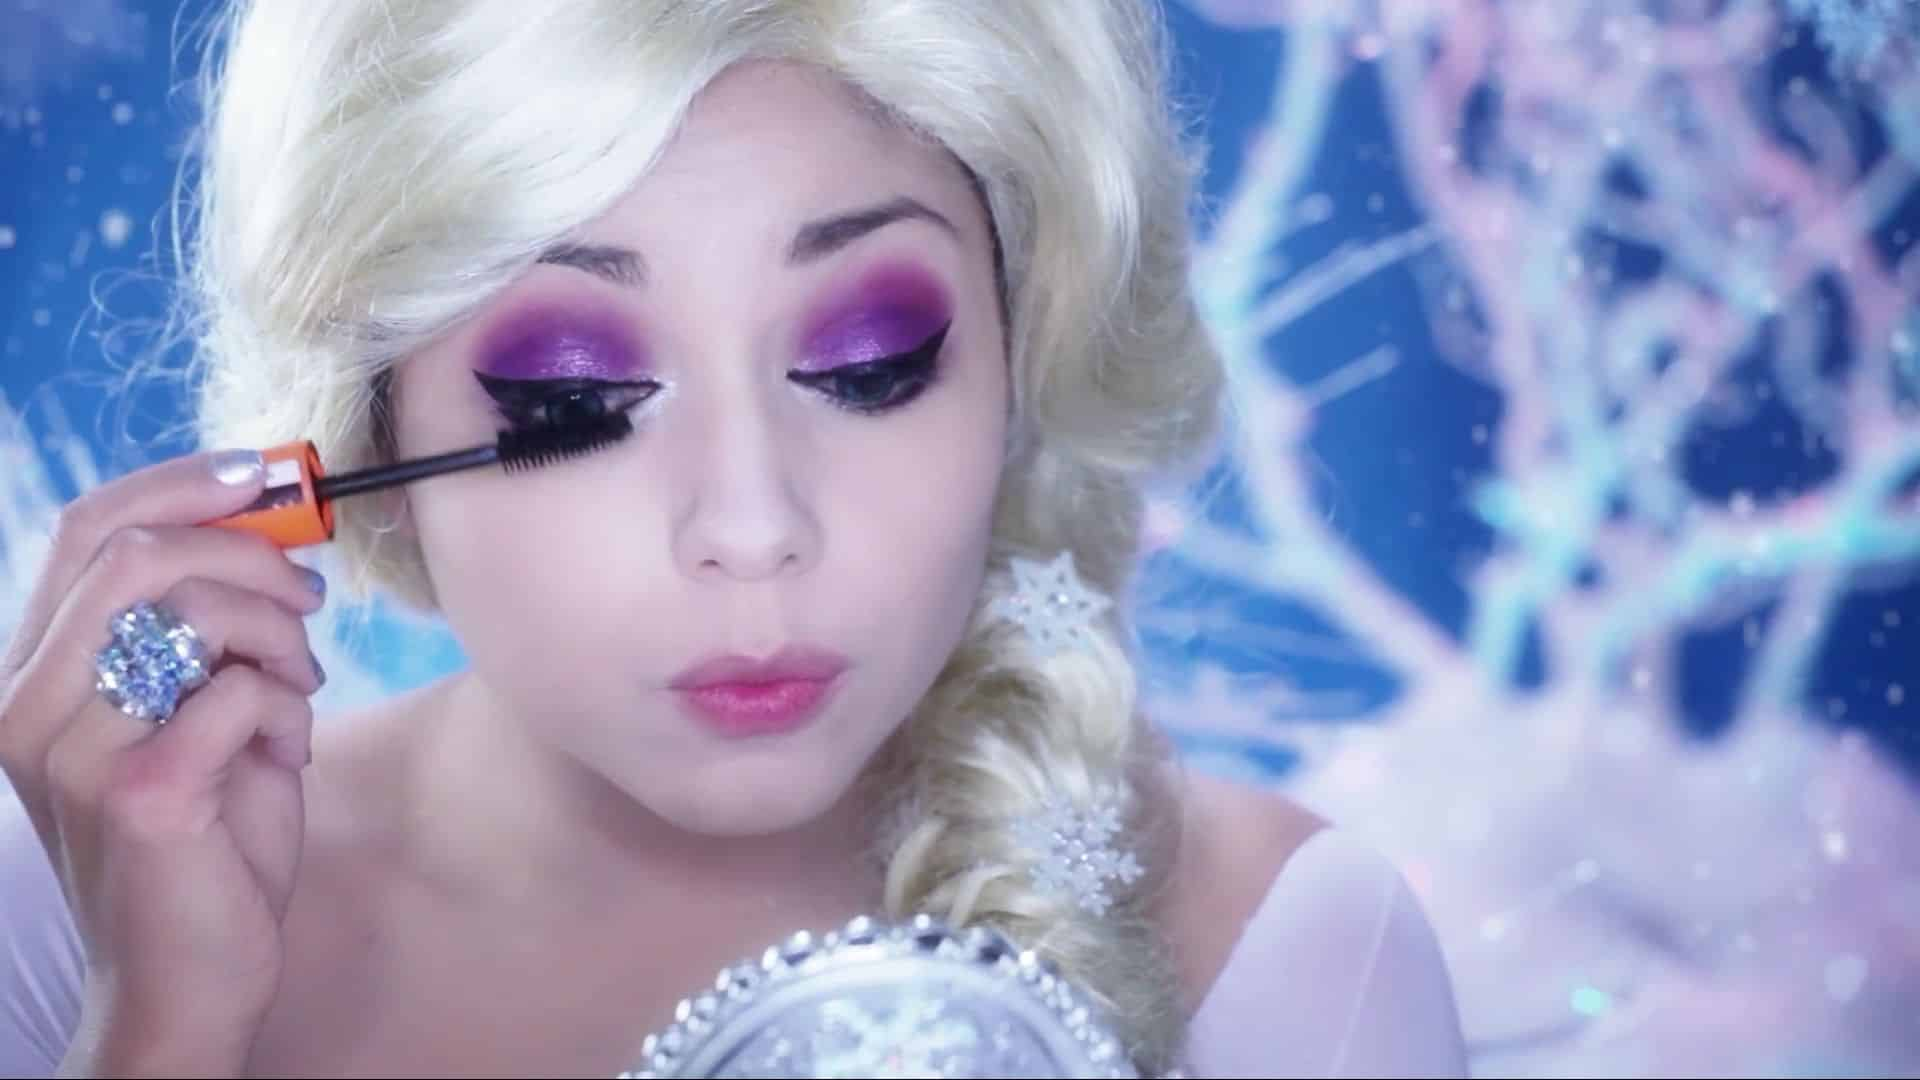 Maquíllate como la princesa Elsa Charisma Star 2020, mascara de pestañas